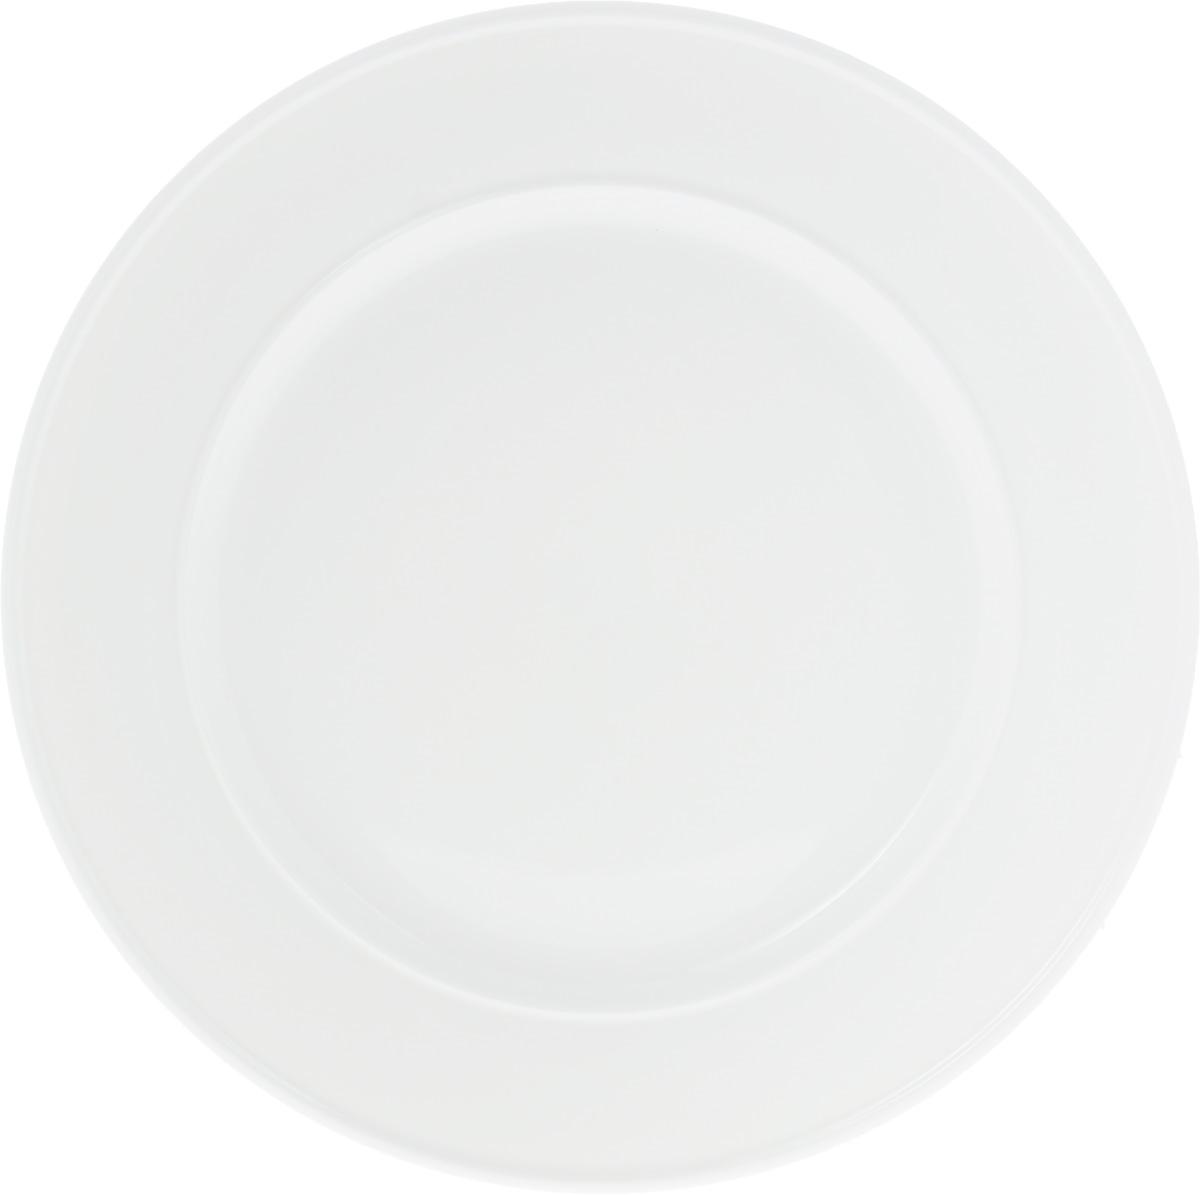 Блюдо Wilmax, диаметр 30,5 см. WL-991244 / A nowodvorski imbria white vi listwa